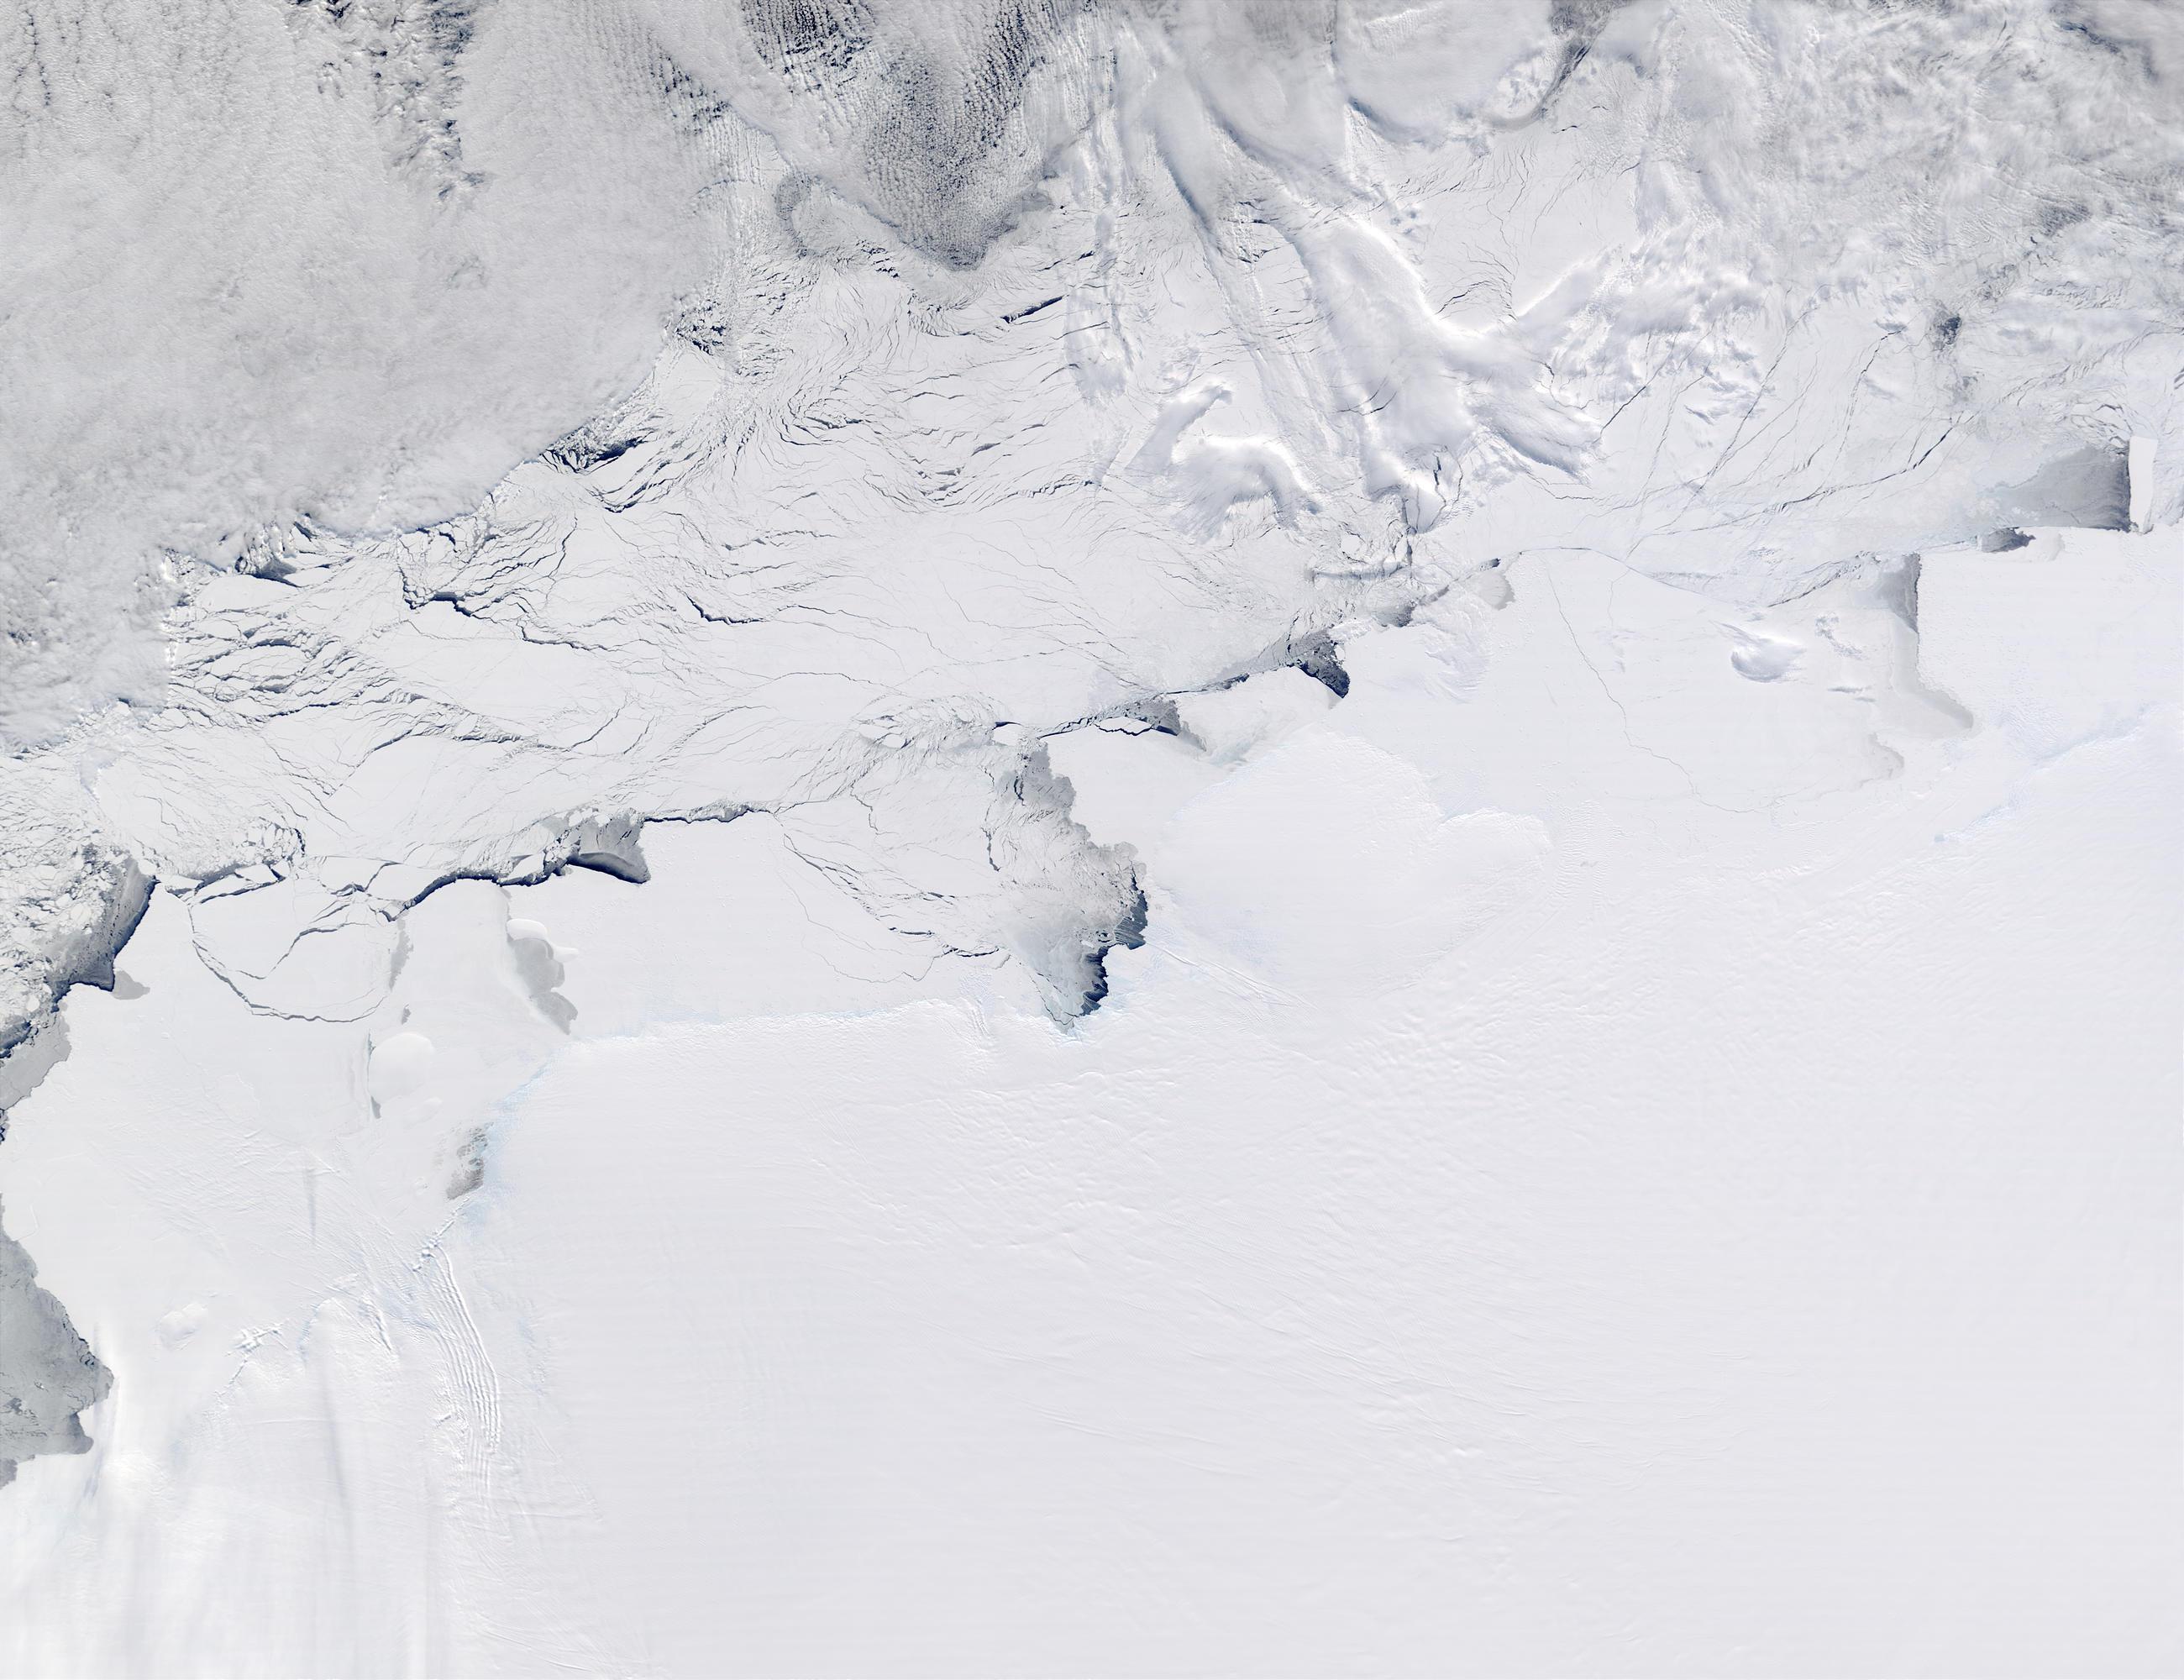 Shackleton Ice Shelf, Knox Coast, Budd Coast, and Sabrina Coast, Antarctica - related image preview